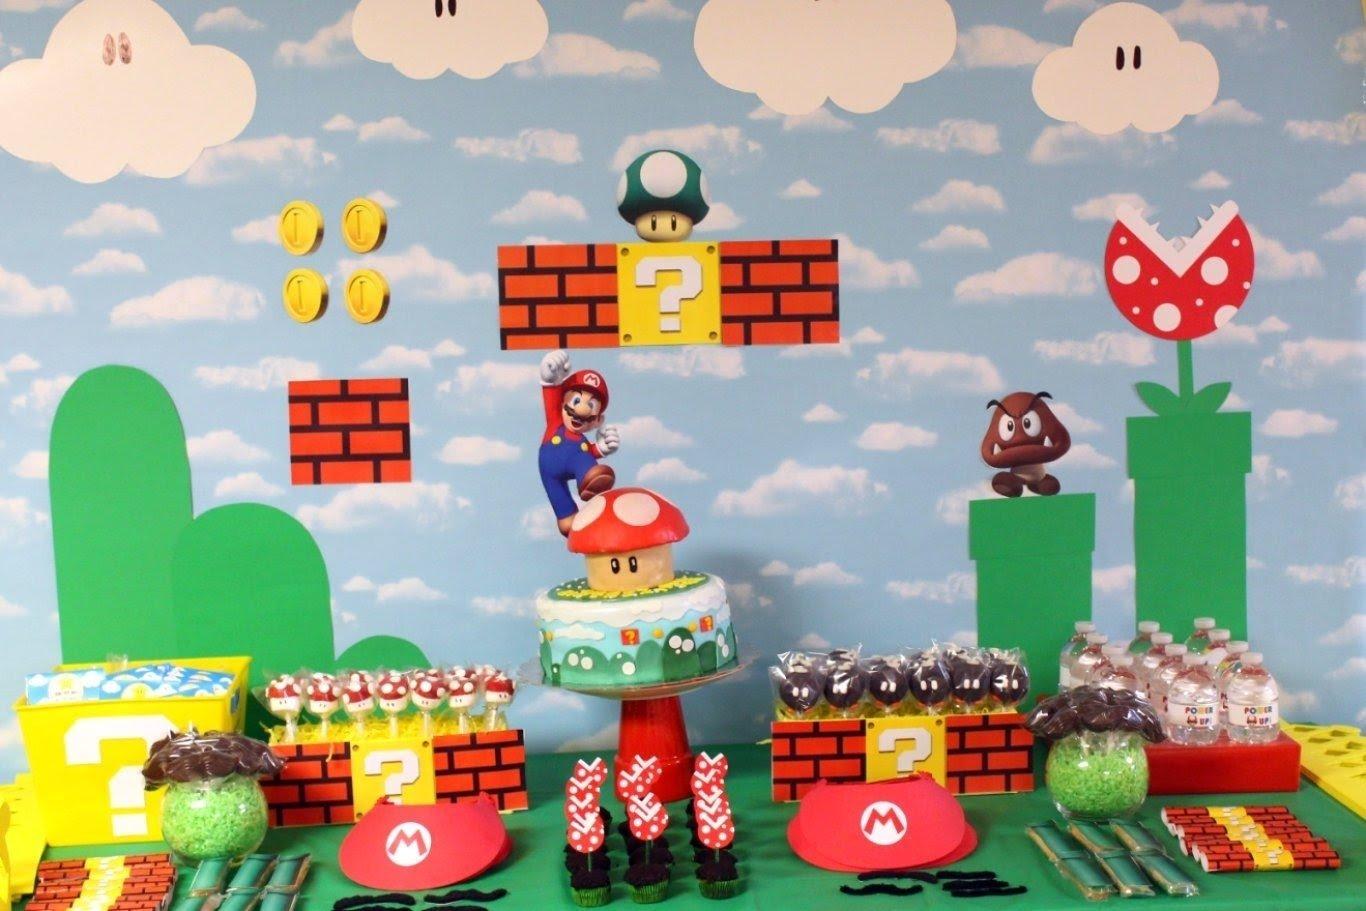 10 Famous Super Mario Bros Party Ideas ideas for mario brothers birthday party criolla brithday wedding 2021